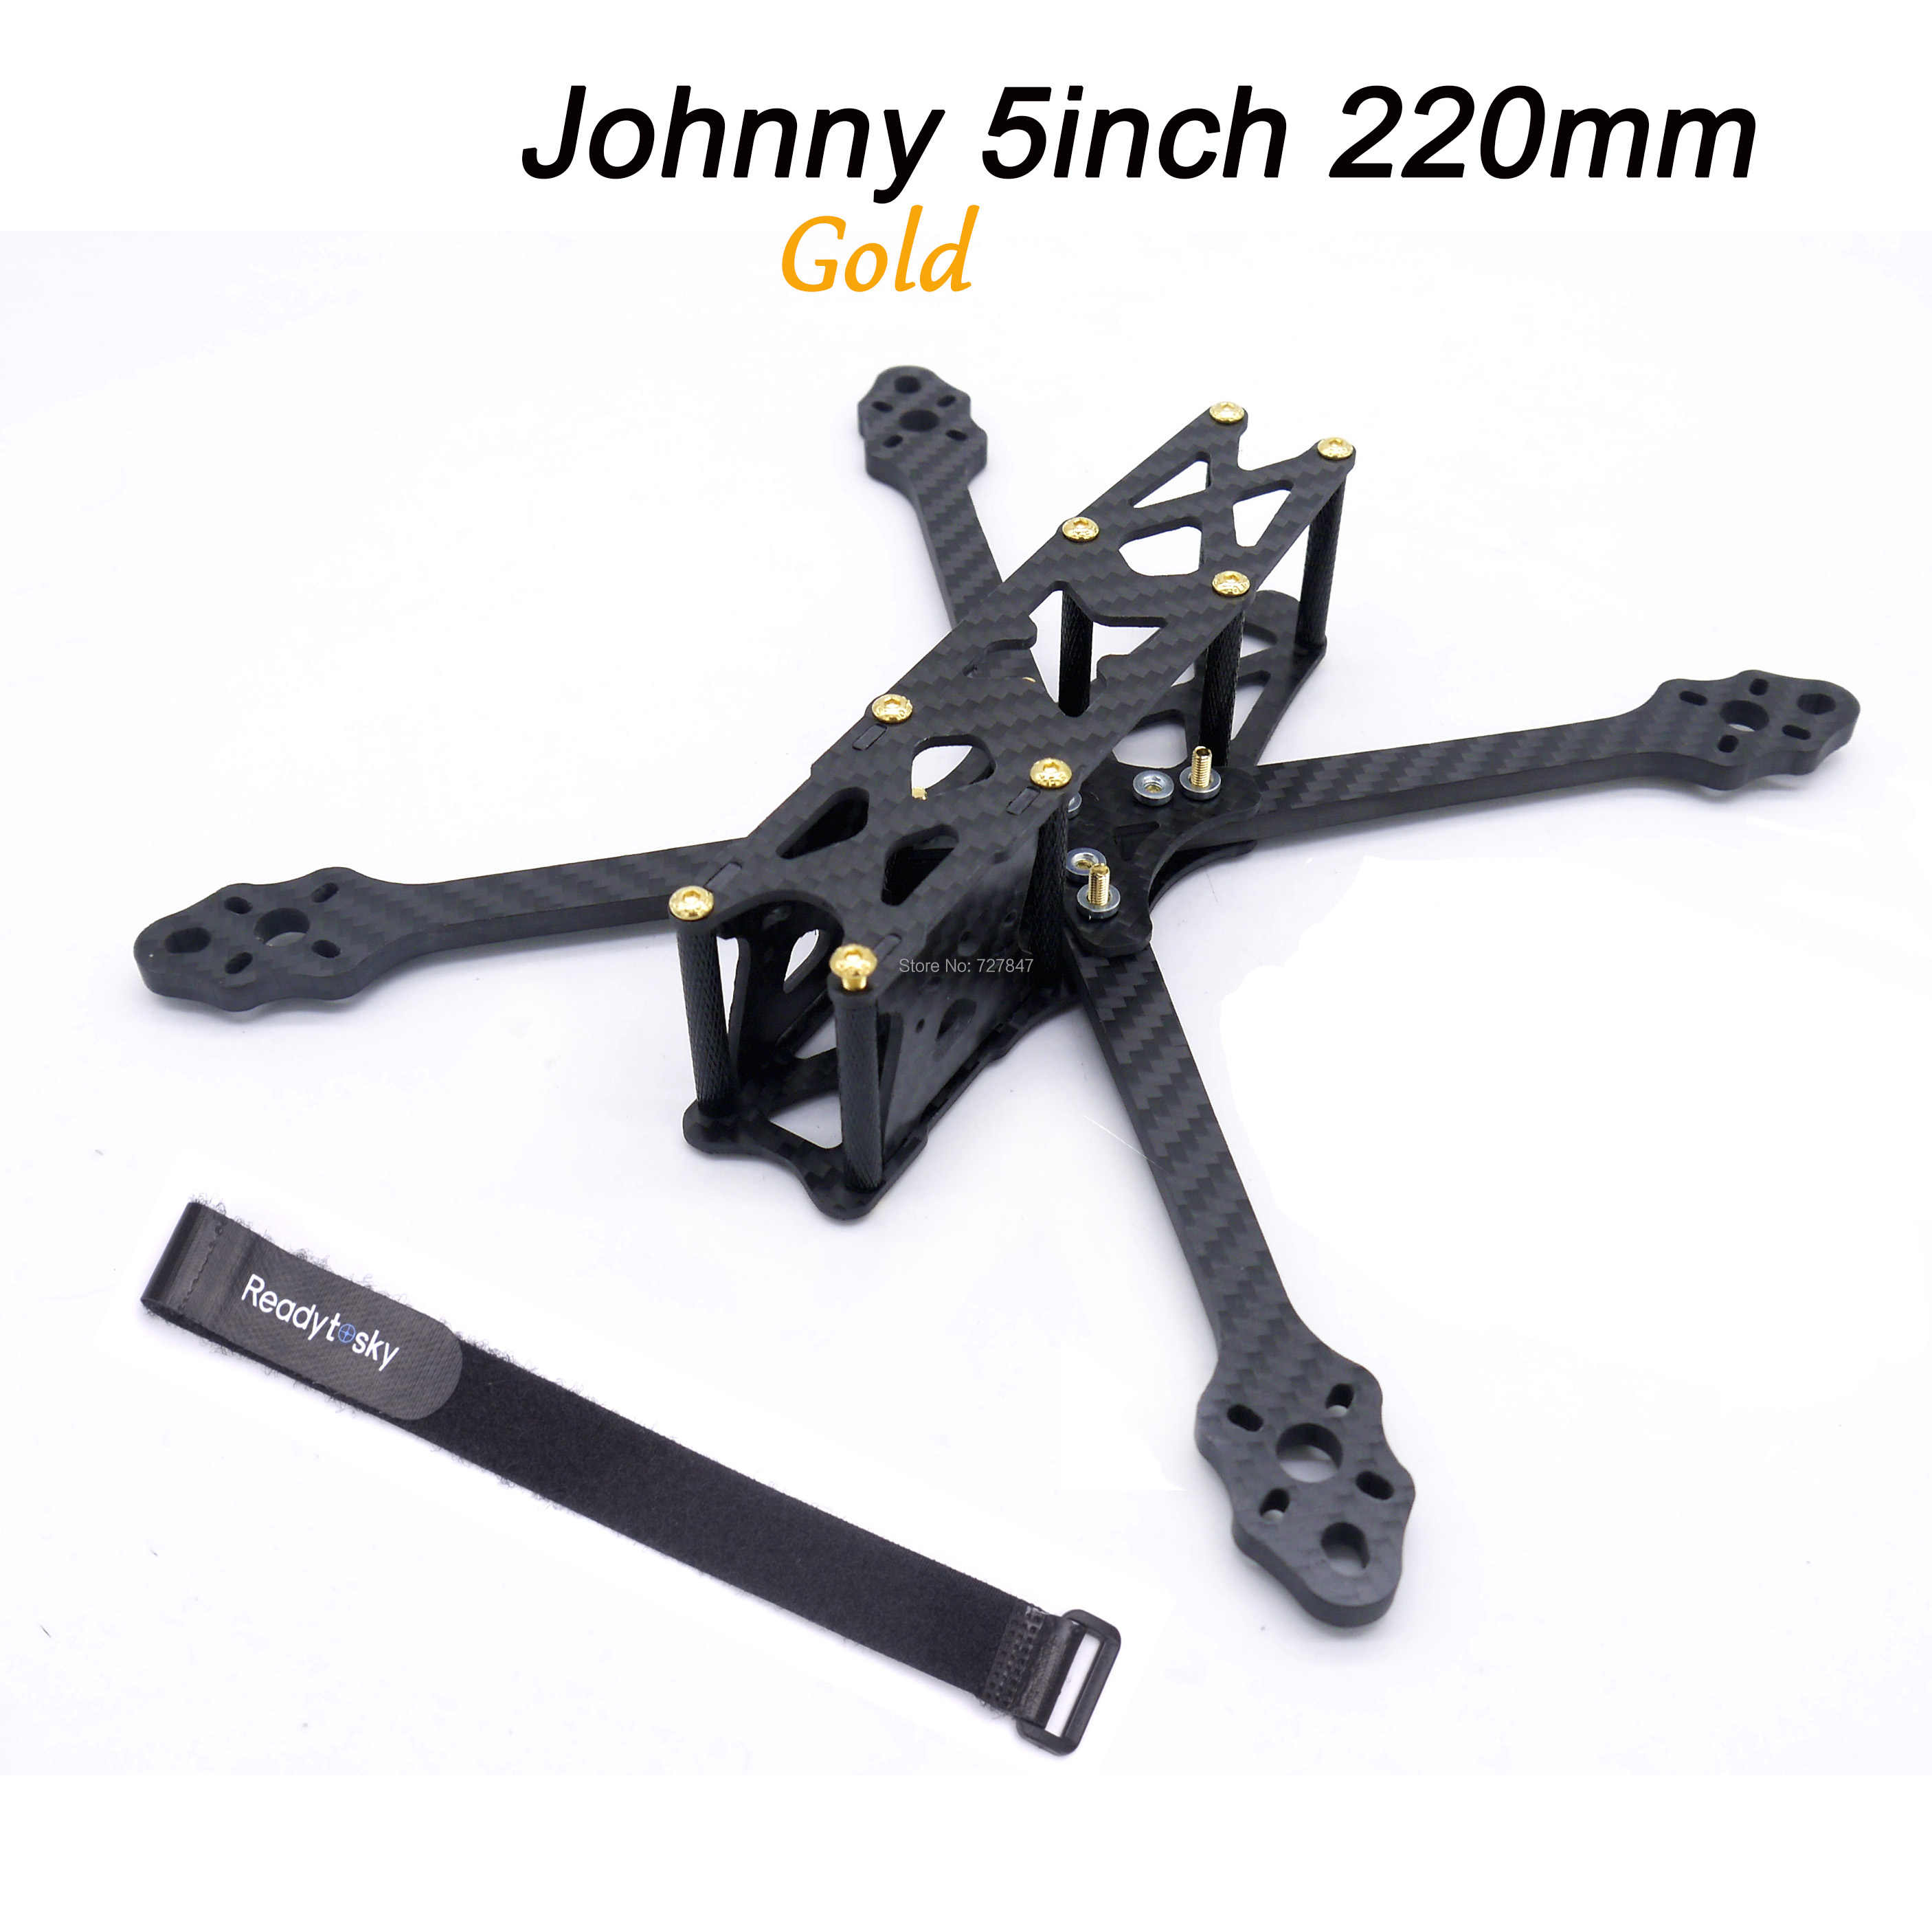 Brazos Johnny 5 pulgadas 220mm 5mm con tornillos de aluminio dorado verdadero kit de Marco X para Dron cuadricóptero FPV